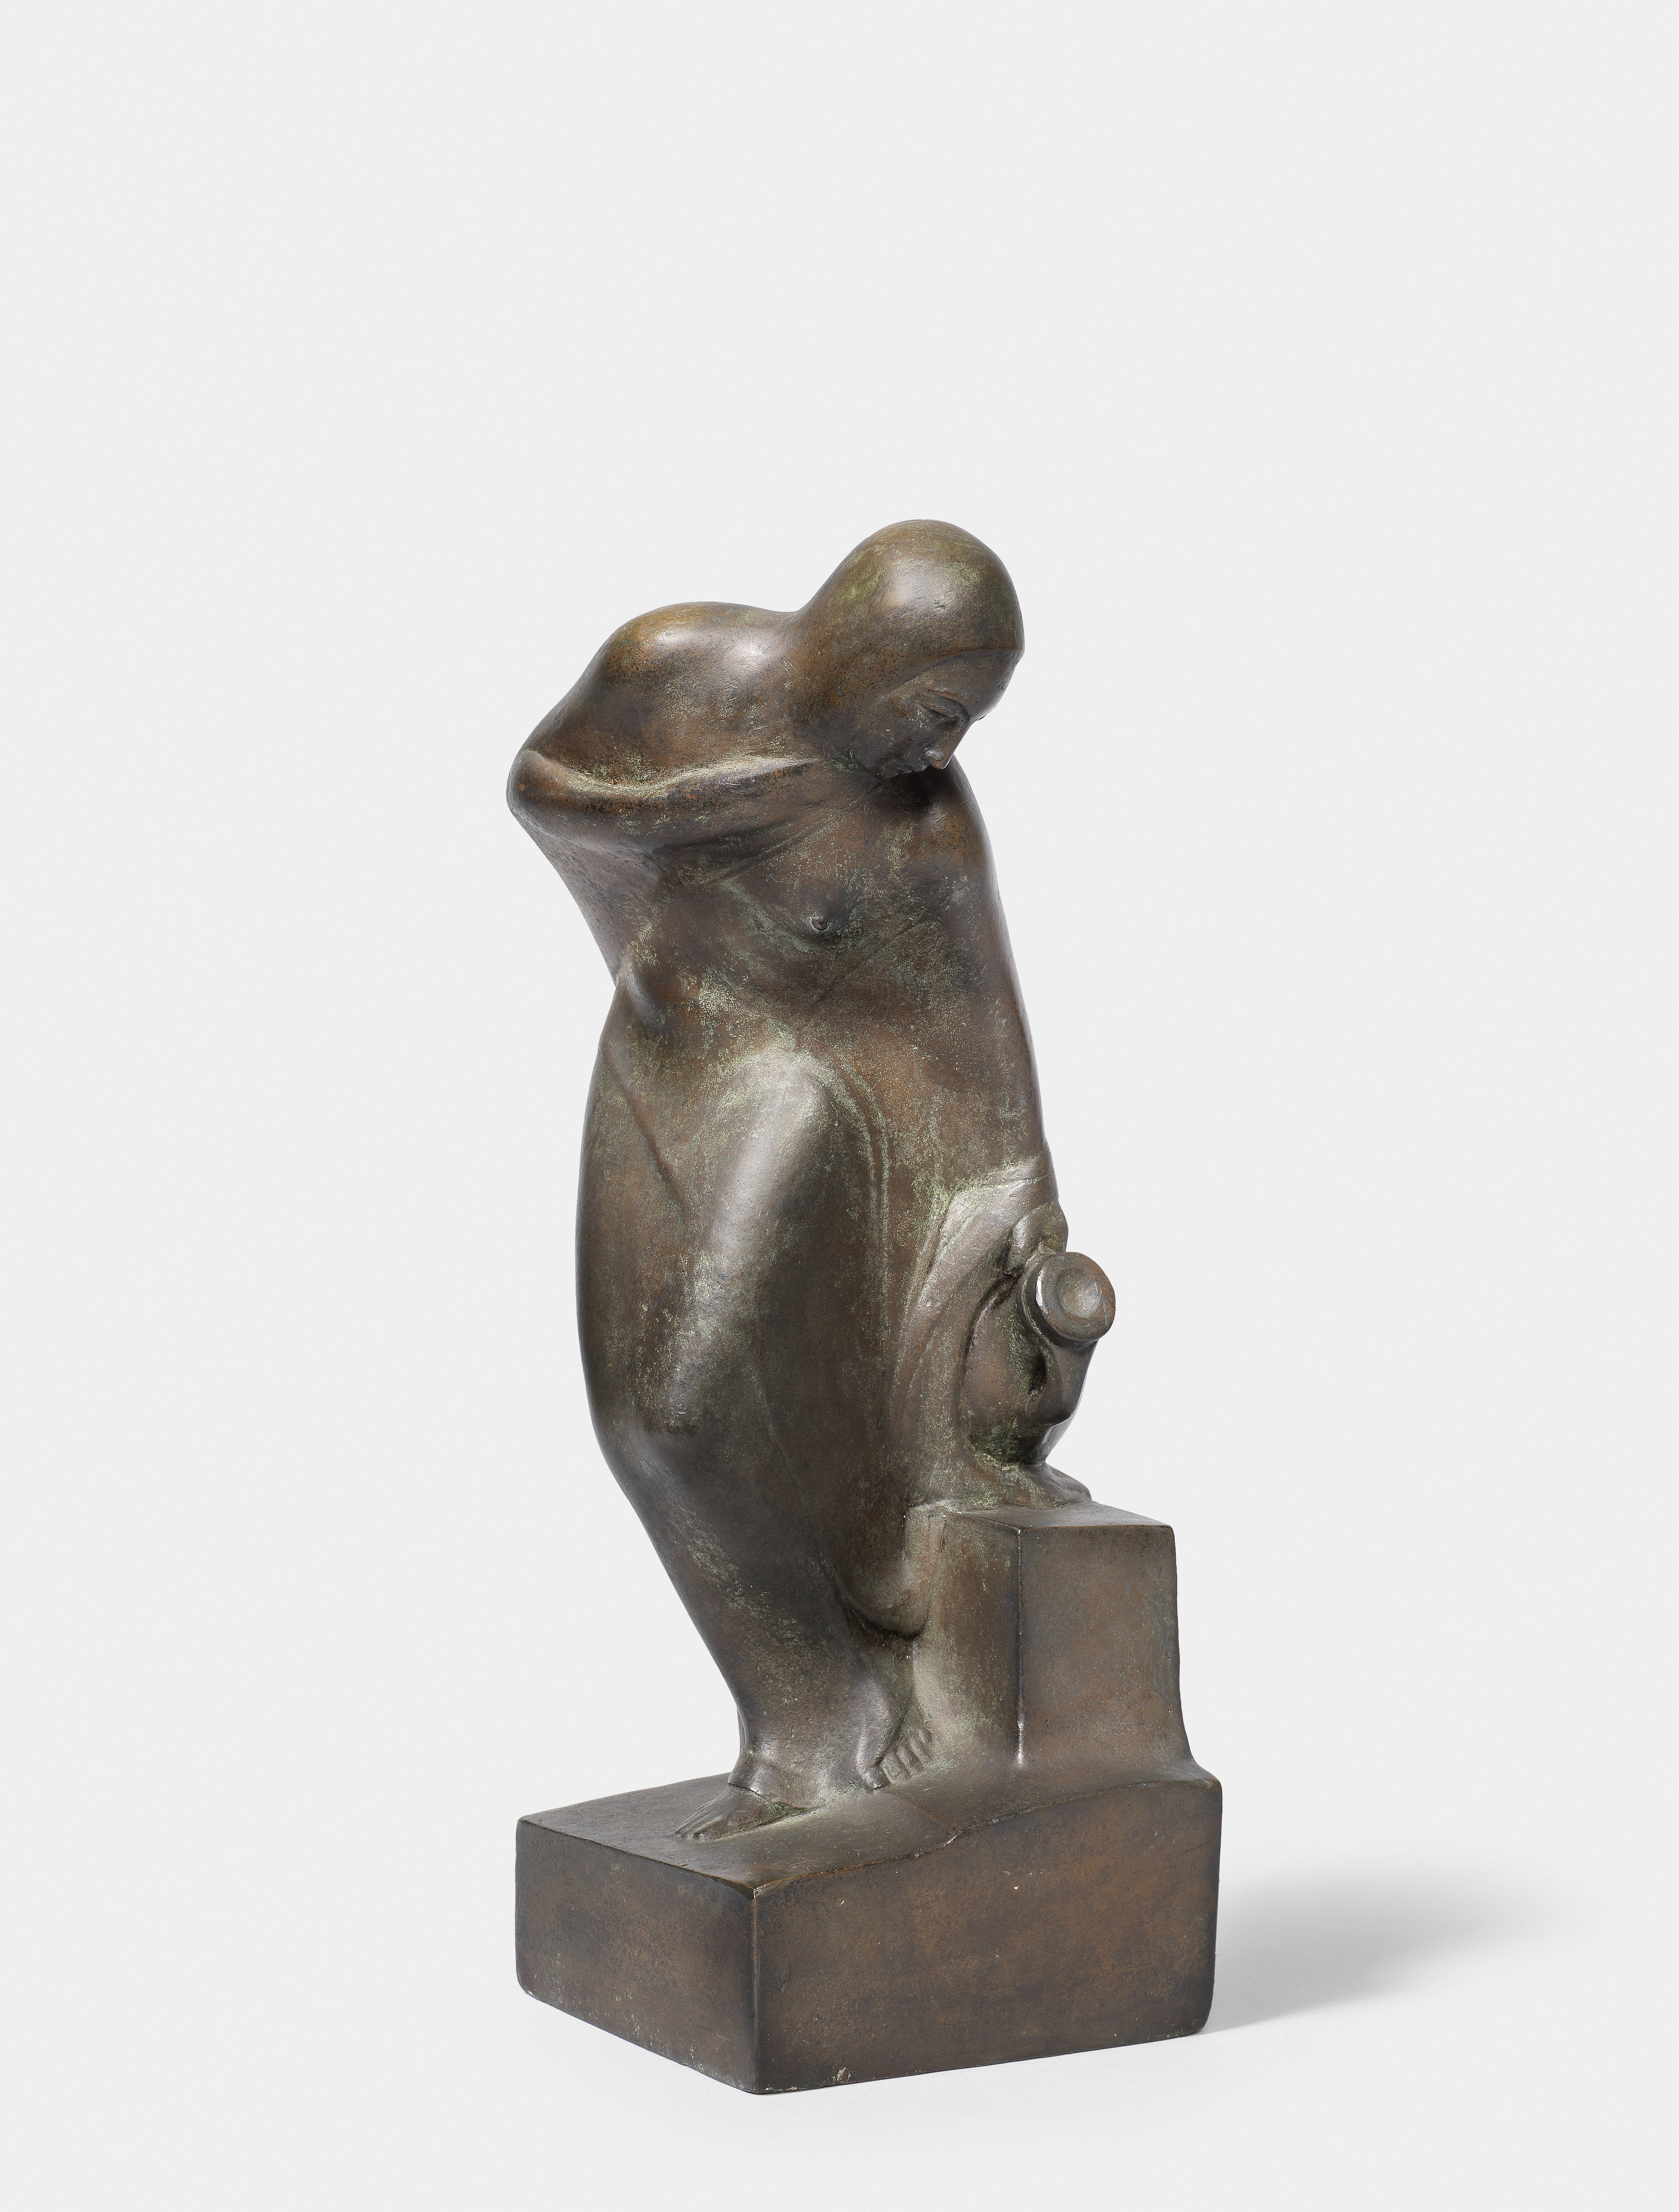 Mahmoud Mokhtar (Egypt, 1891-1934) On the Banks of the Nile